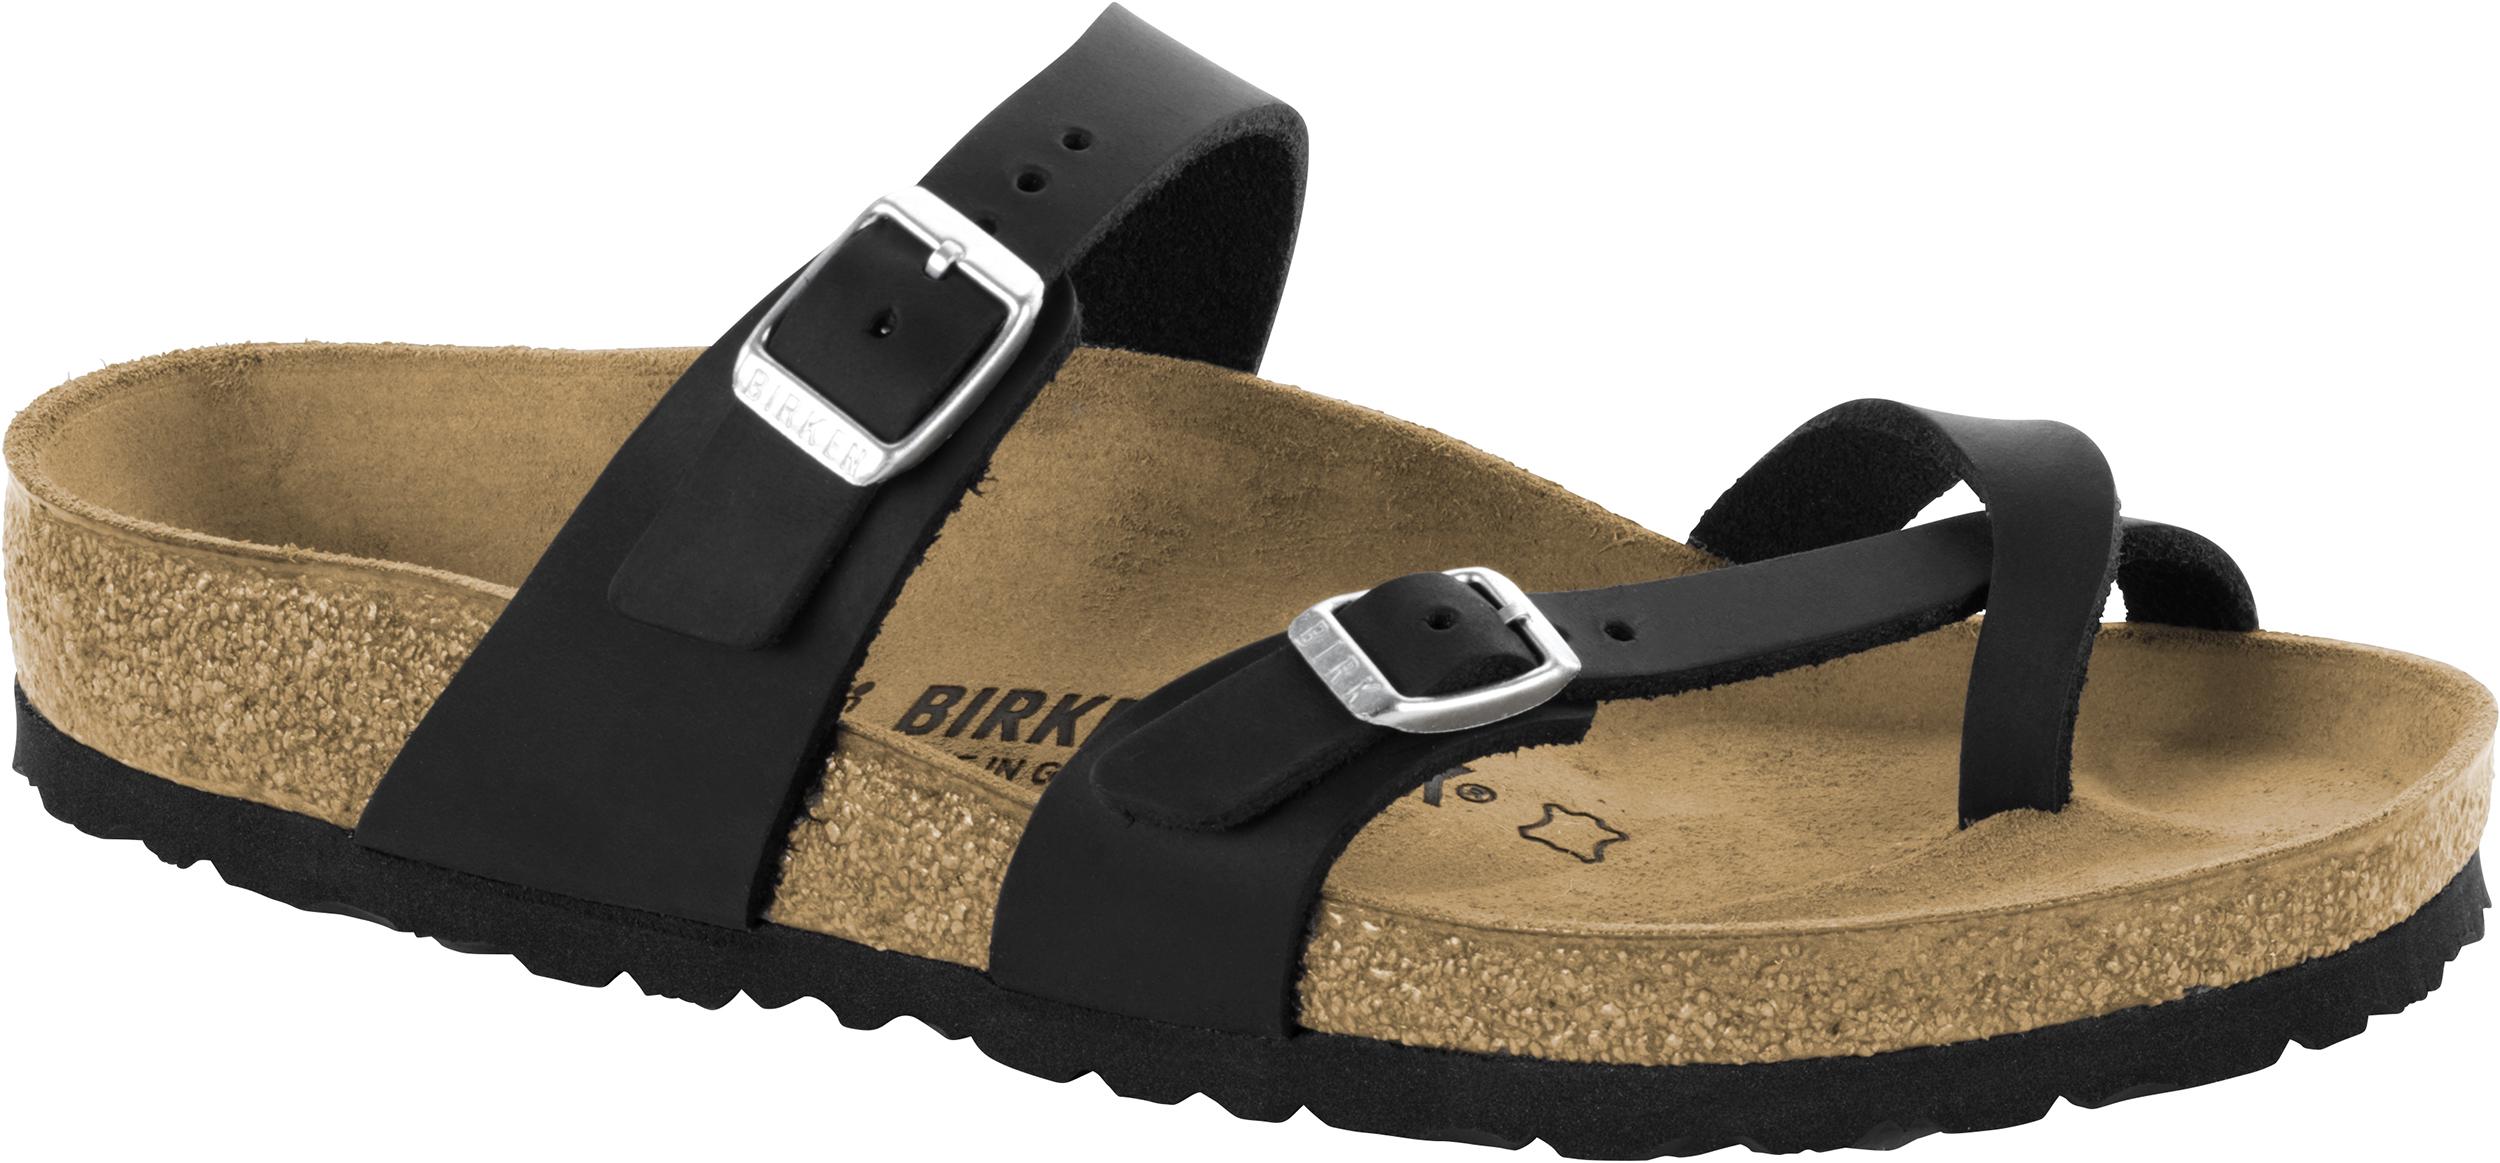 7caf71552196 Footwear